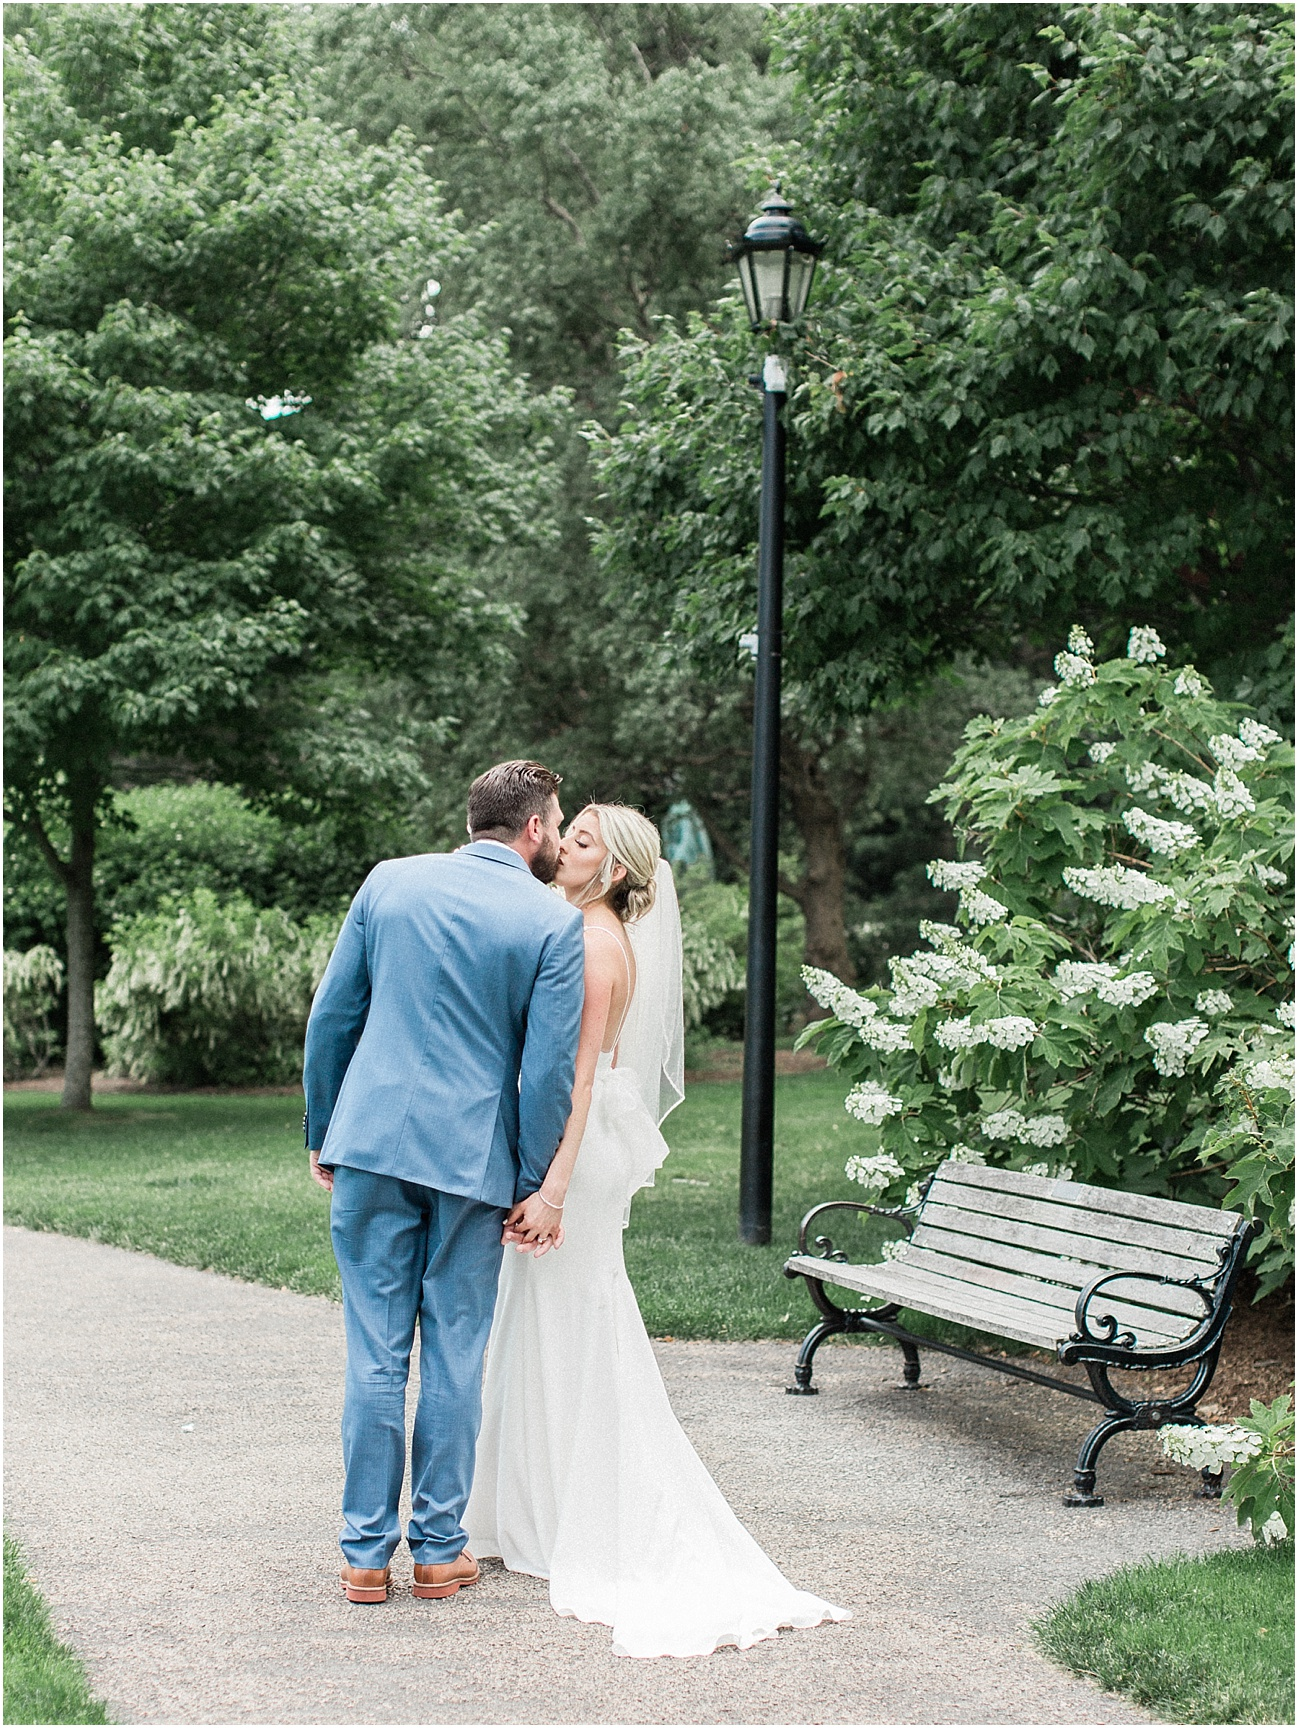 lindsey_paul_indian_pond_country_club_wild_dahlia_brewster_gardens_plymouth_cape_cod_boston_wedding_photographer_meredith_jane_photography_photo_0376.jpg